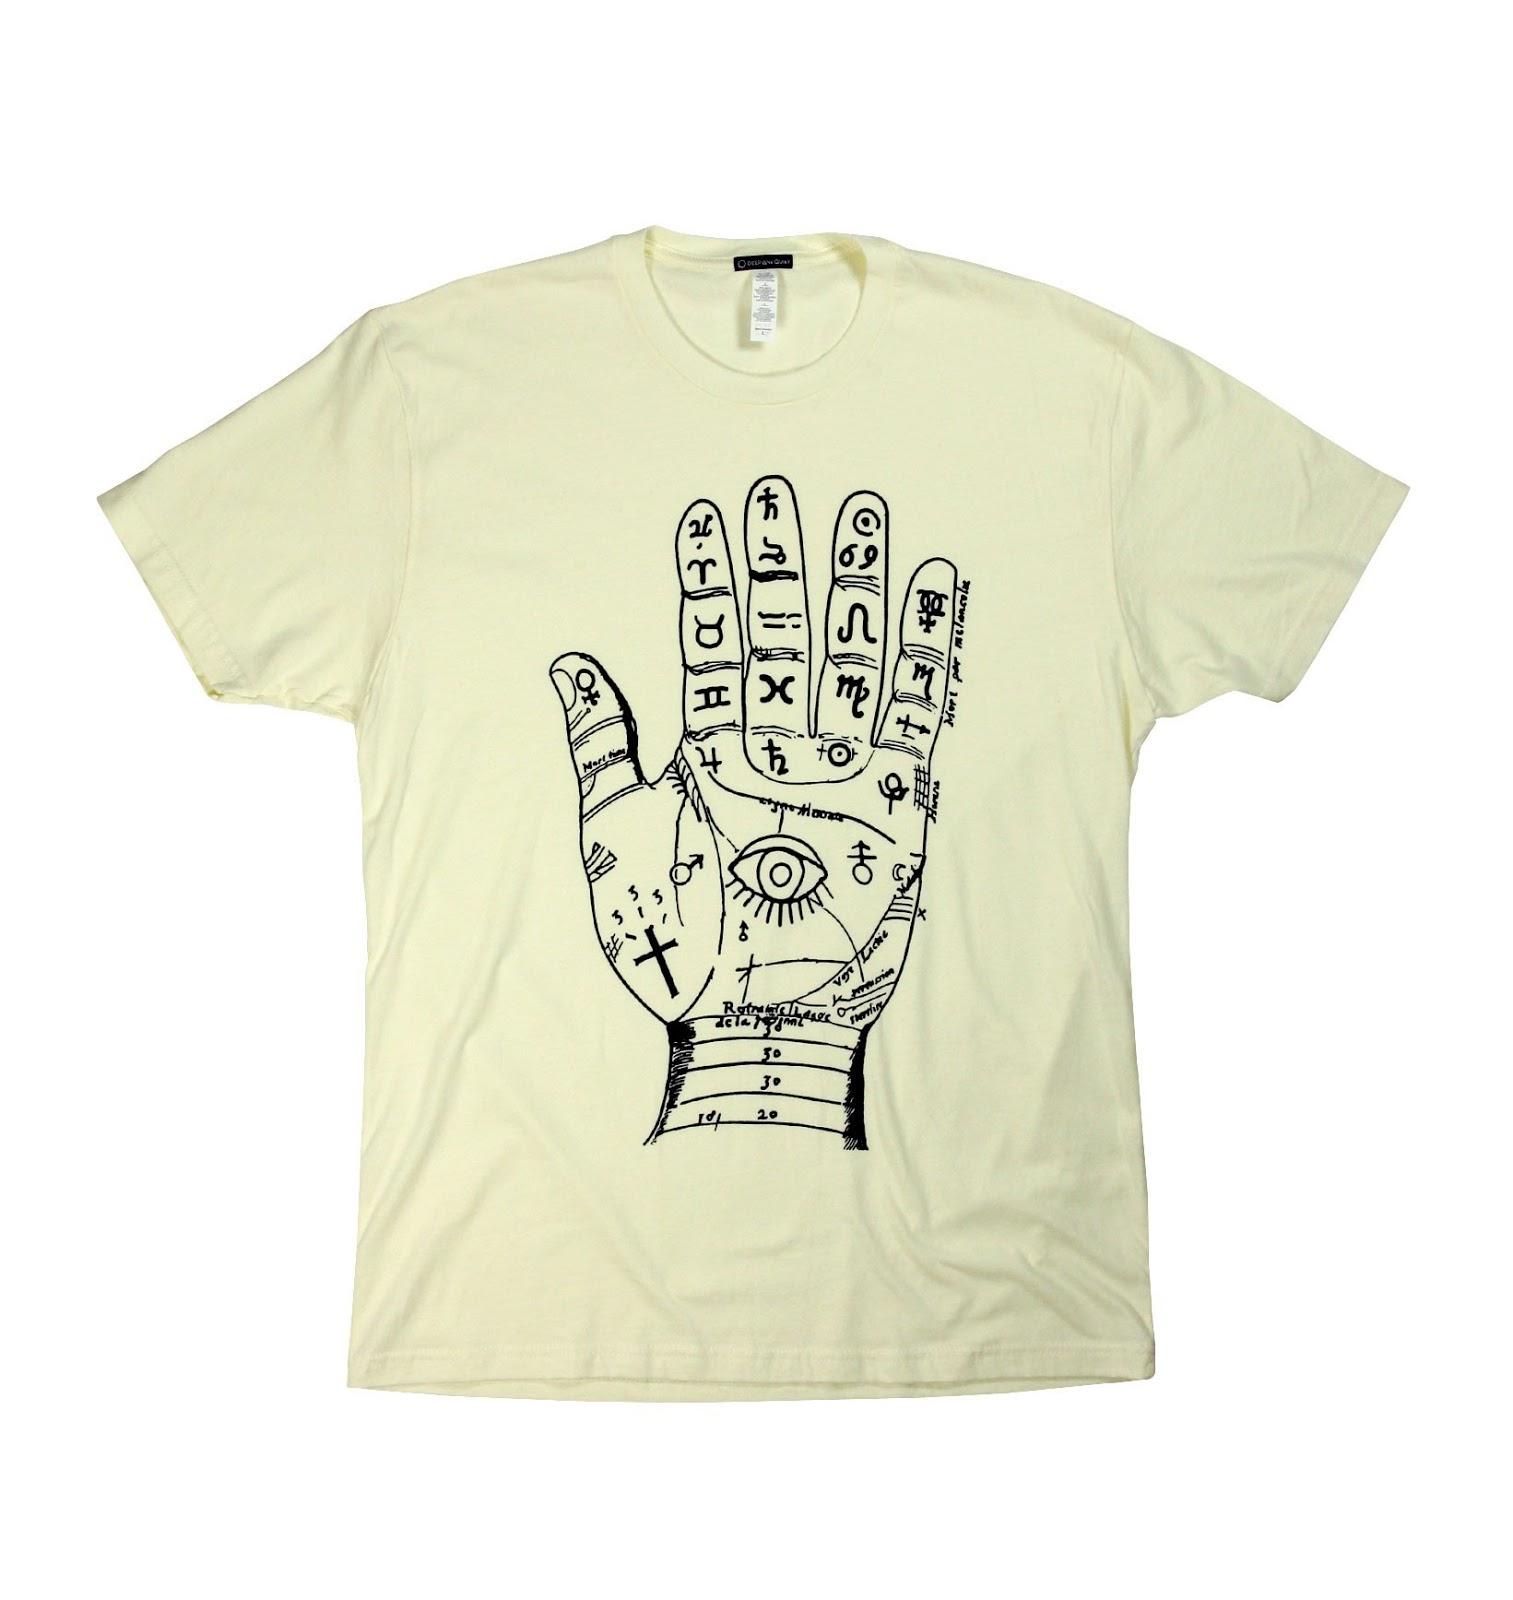 https://grafitee.es/s/camisetas/113-t-shirt-palm-reader-cream.html